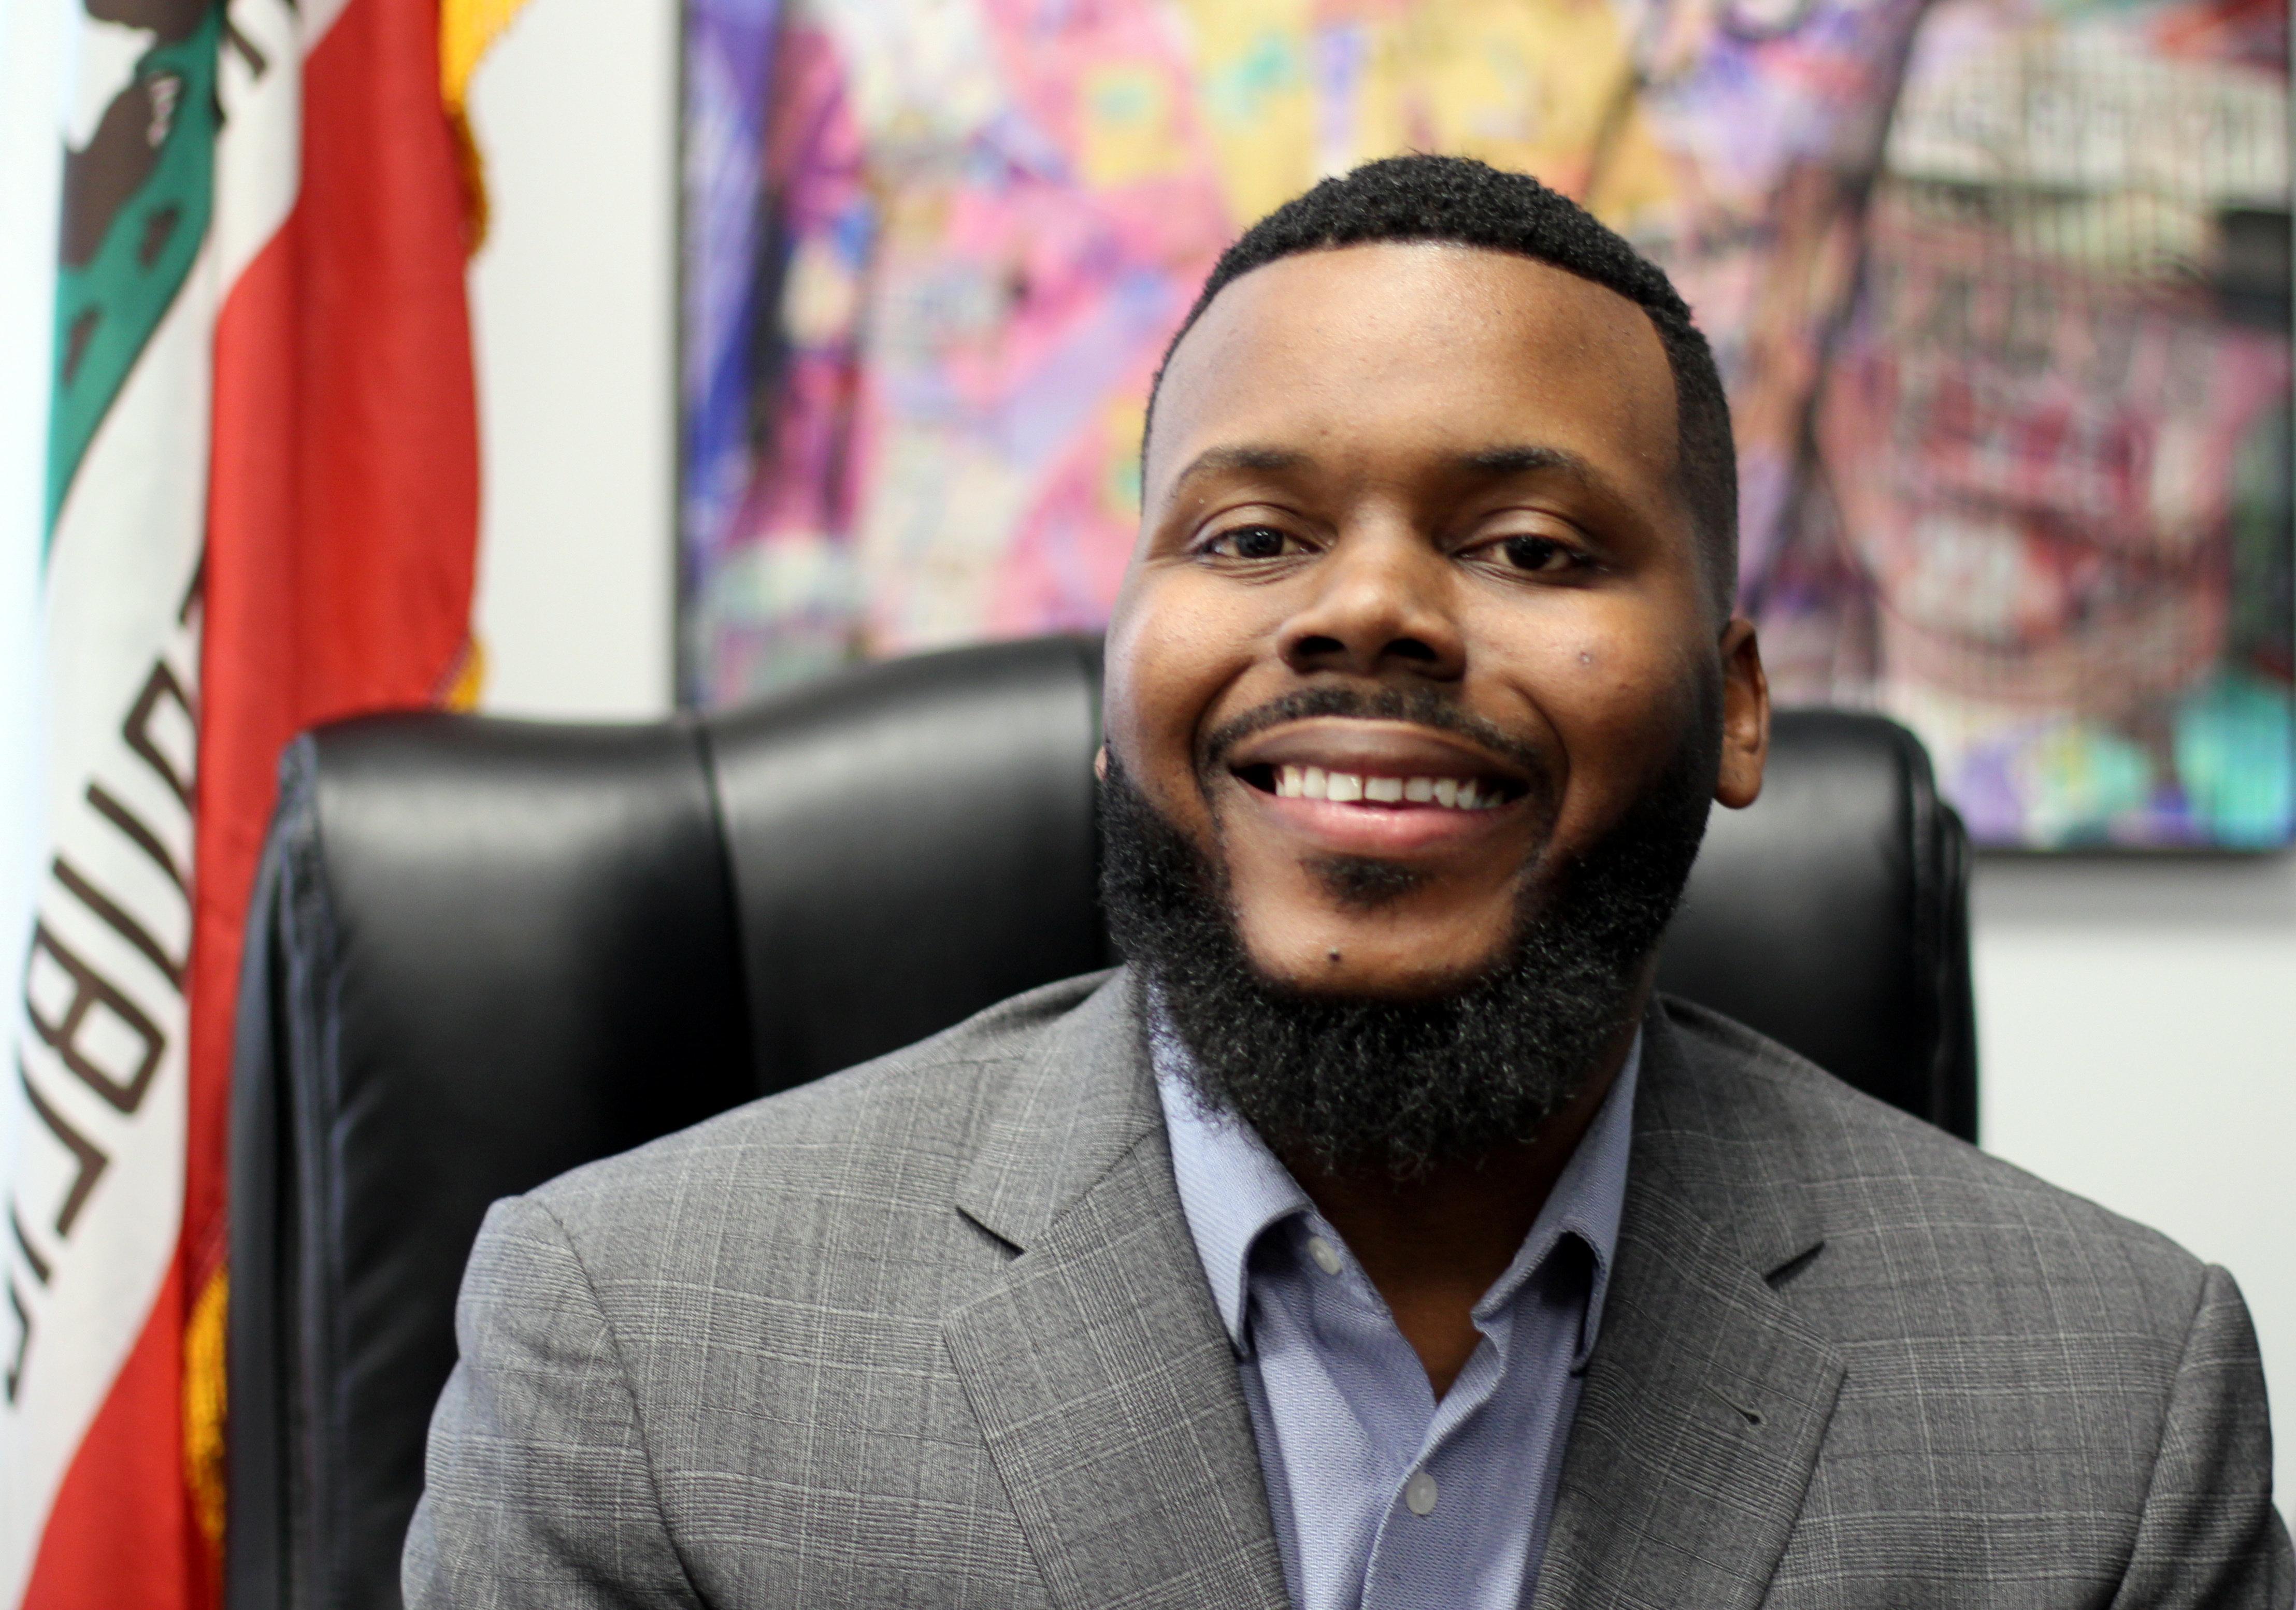 27-Jähriger US-Bürgermeister verschenkt Geld an Bürger – und will so Armut